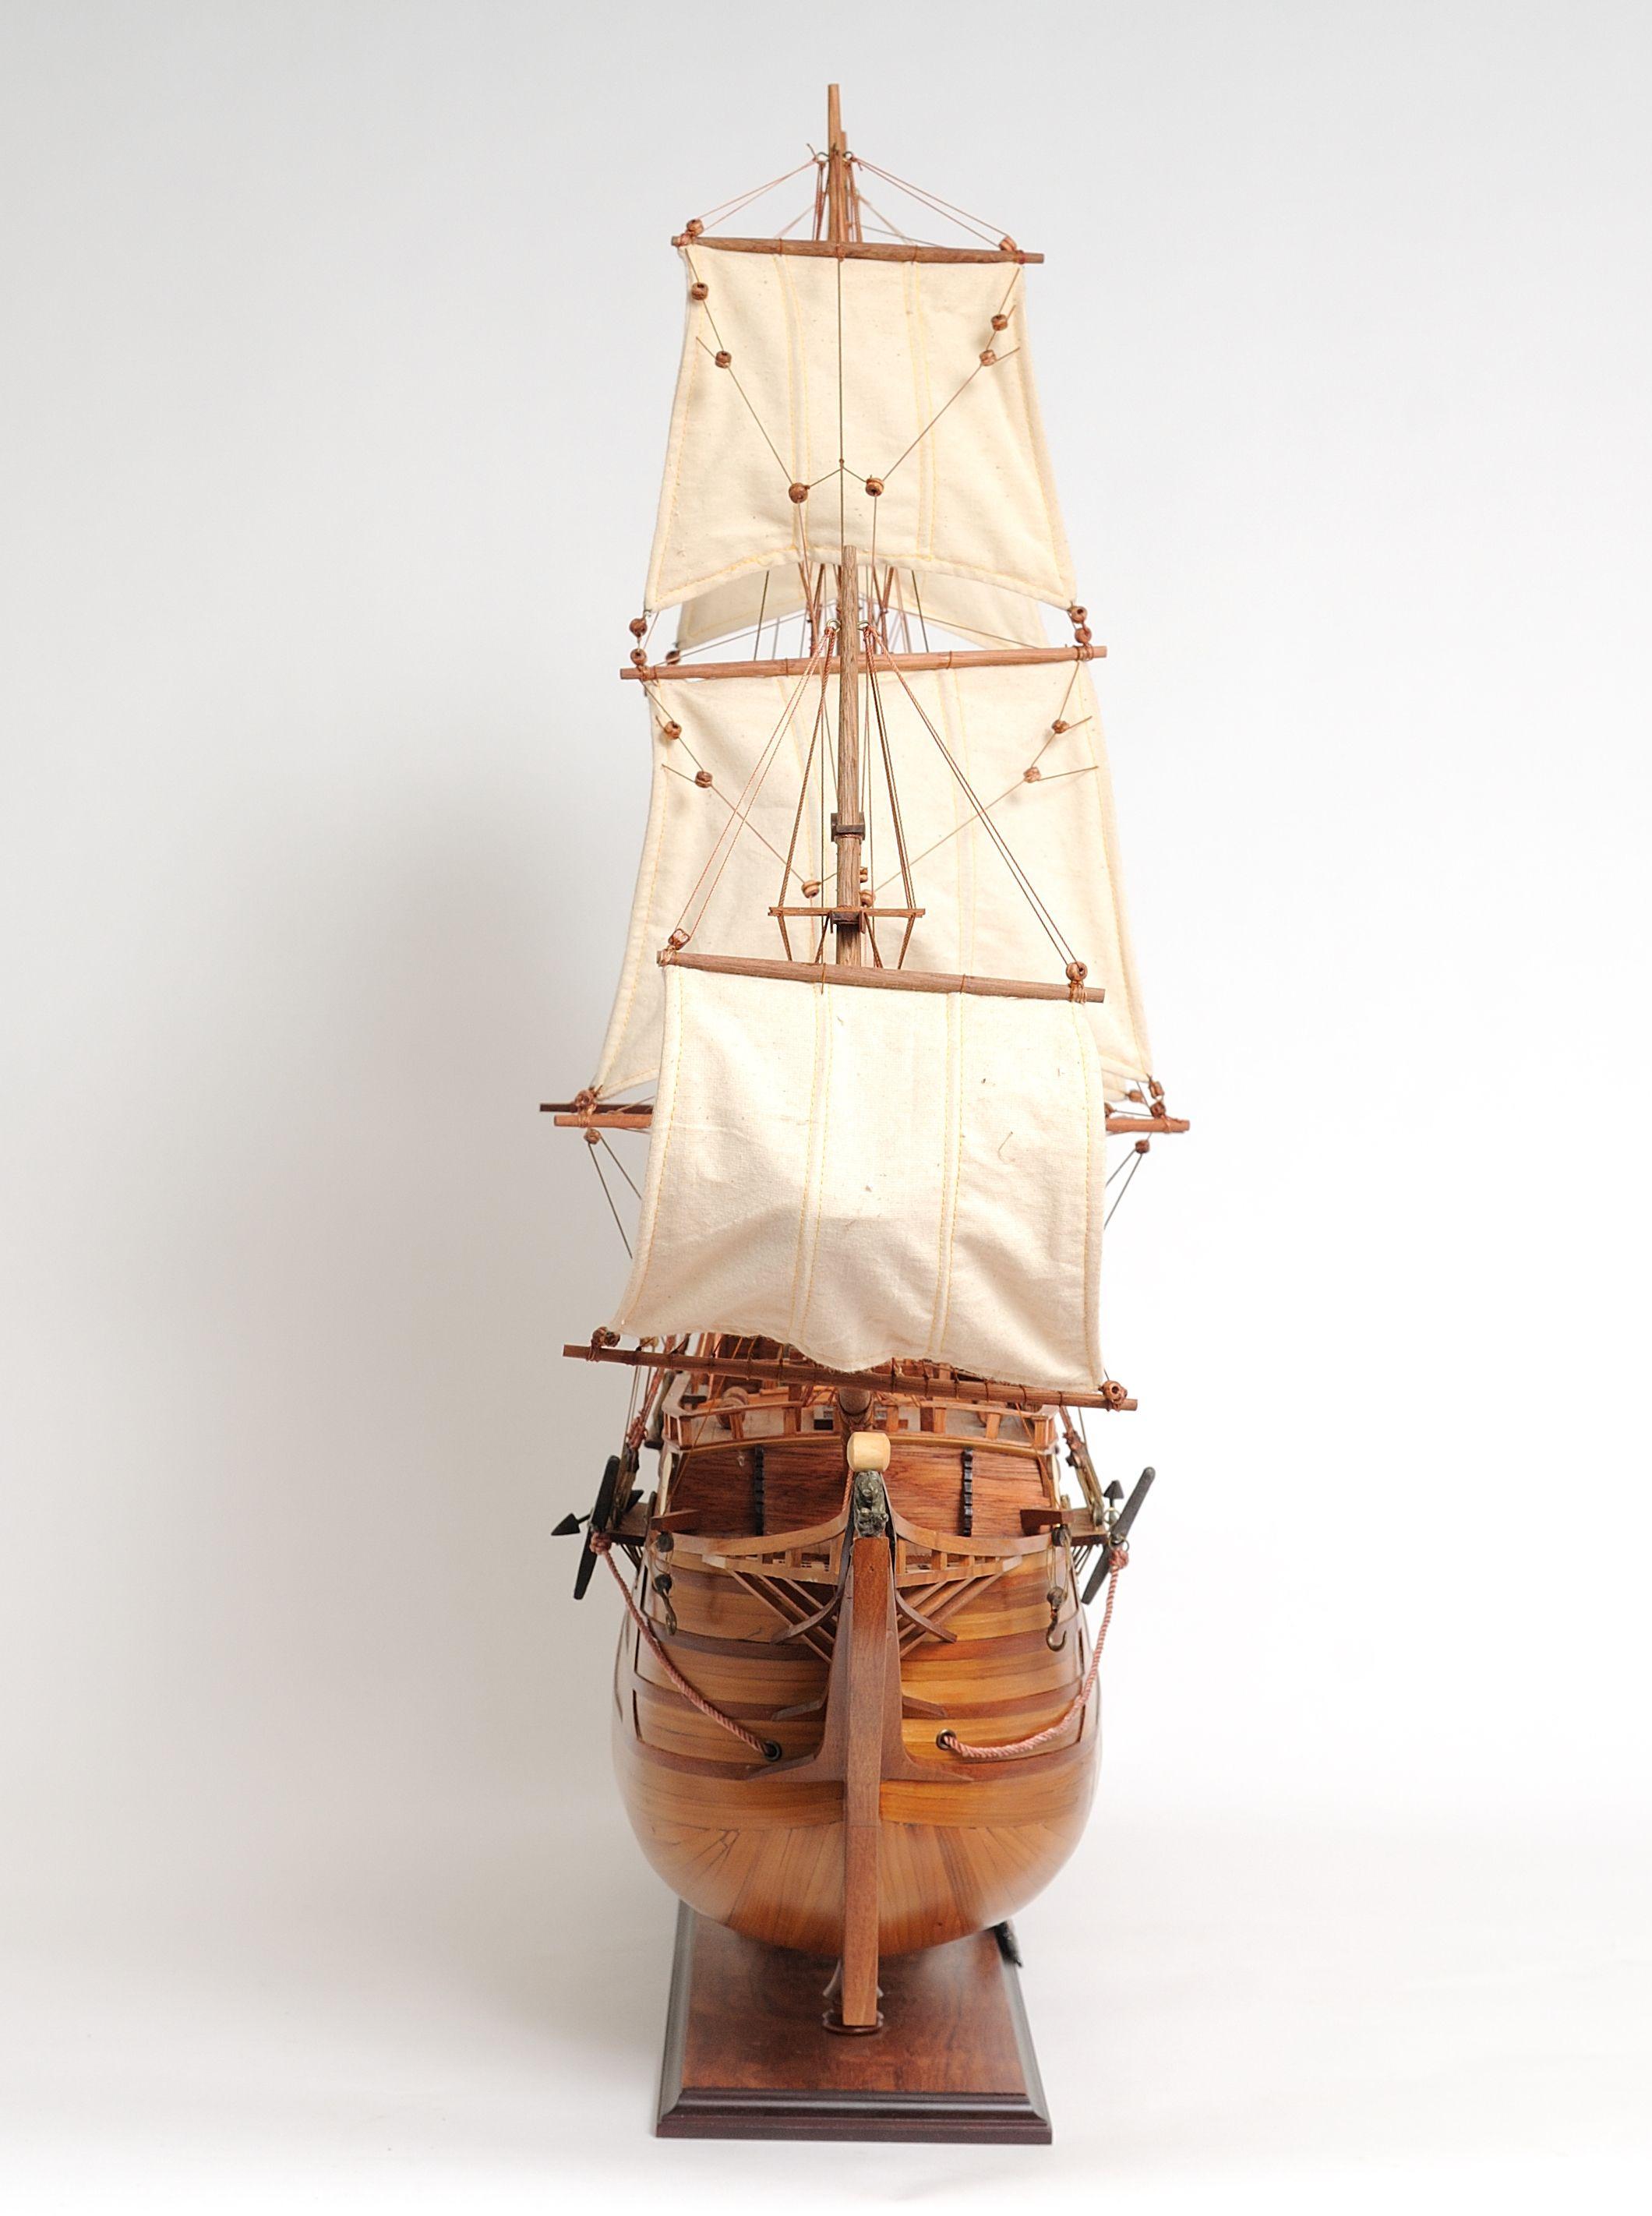 2277-12989-Arabella-Model-Ship